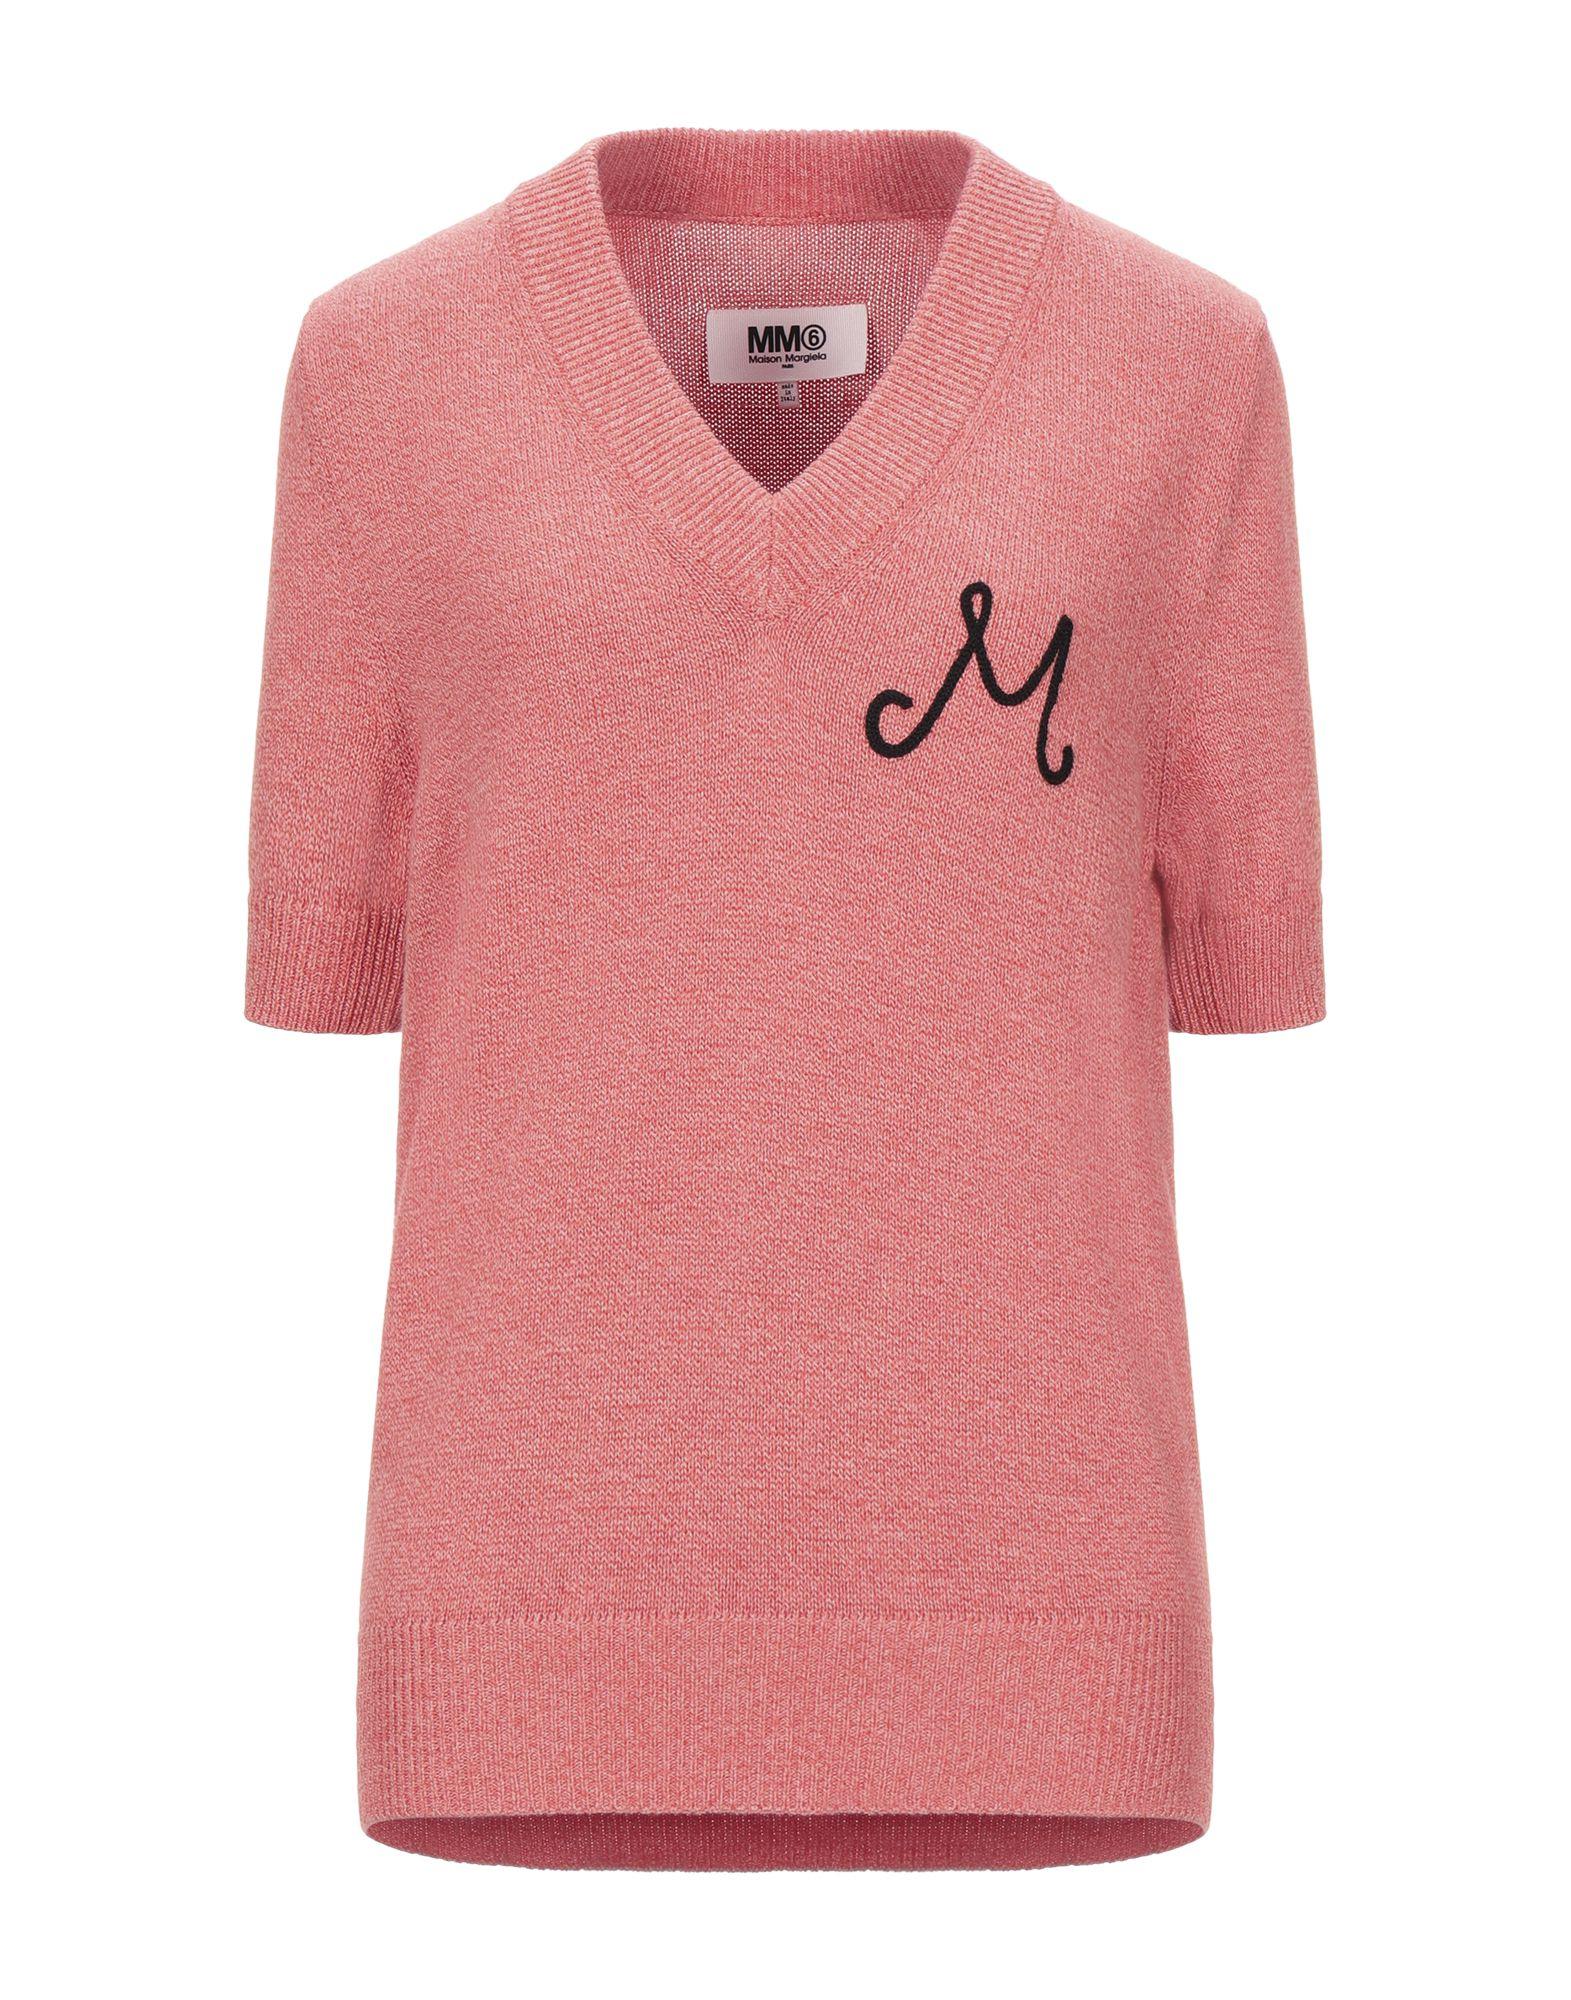 MM6 MAISON MARGIELA Sweaters. knitted, mélange, logo, lightweight knit, v-neck, solid color, short sleeves, no pockets. 100% Cotton